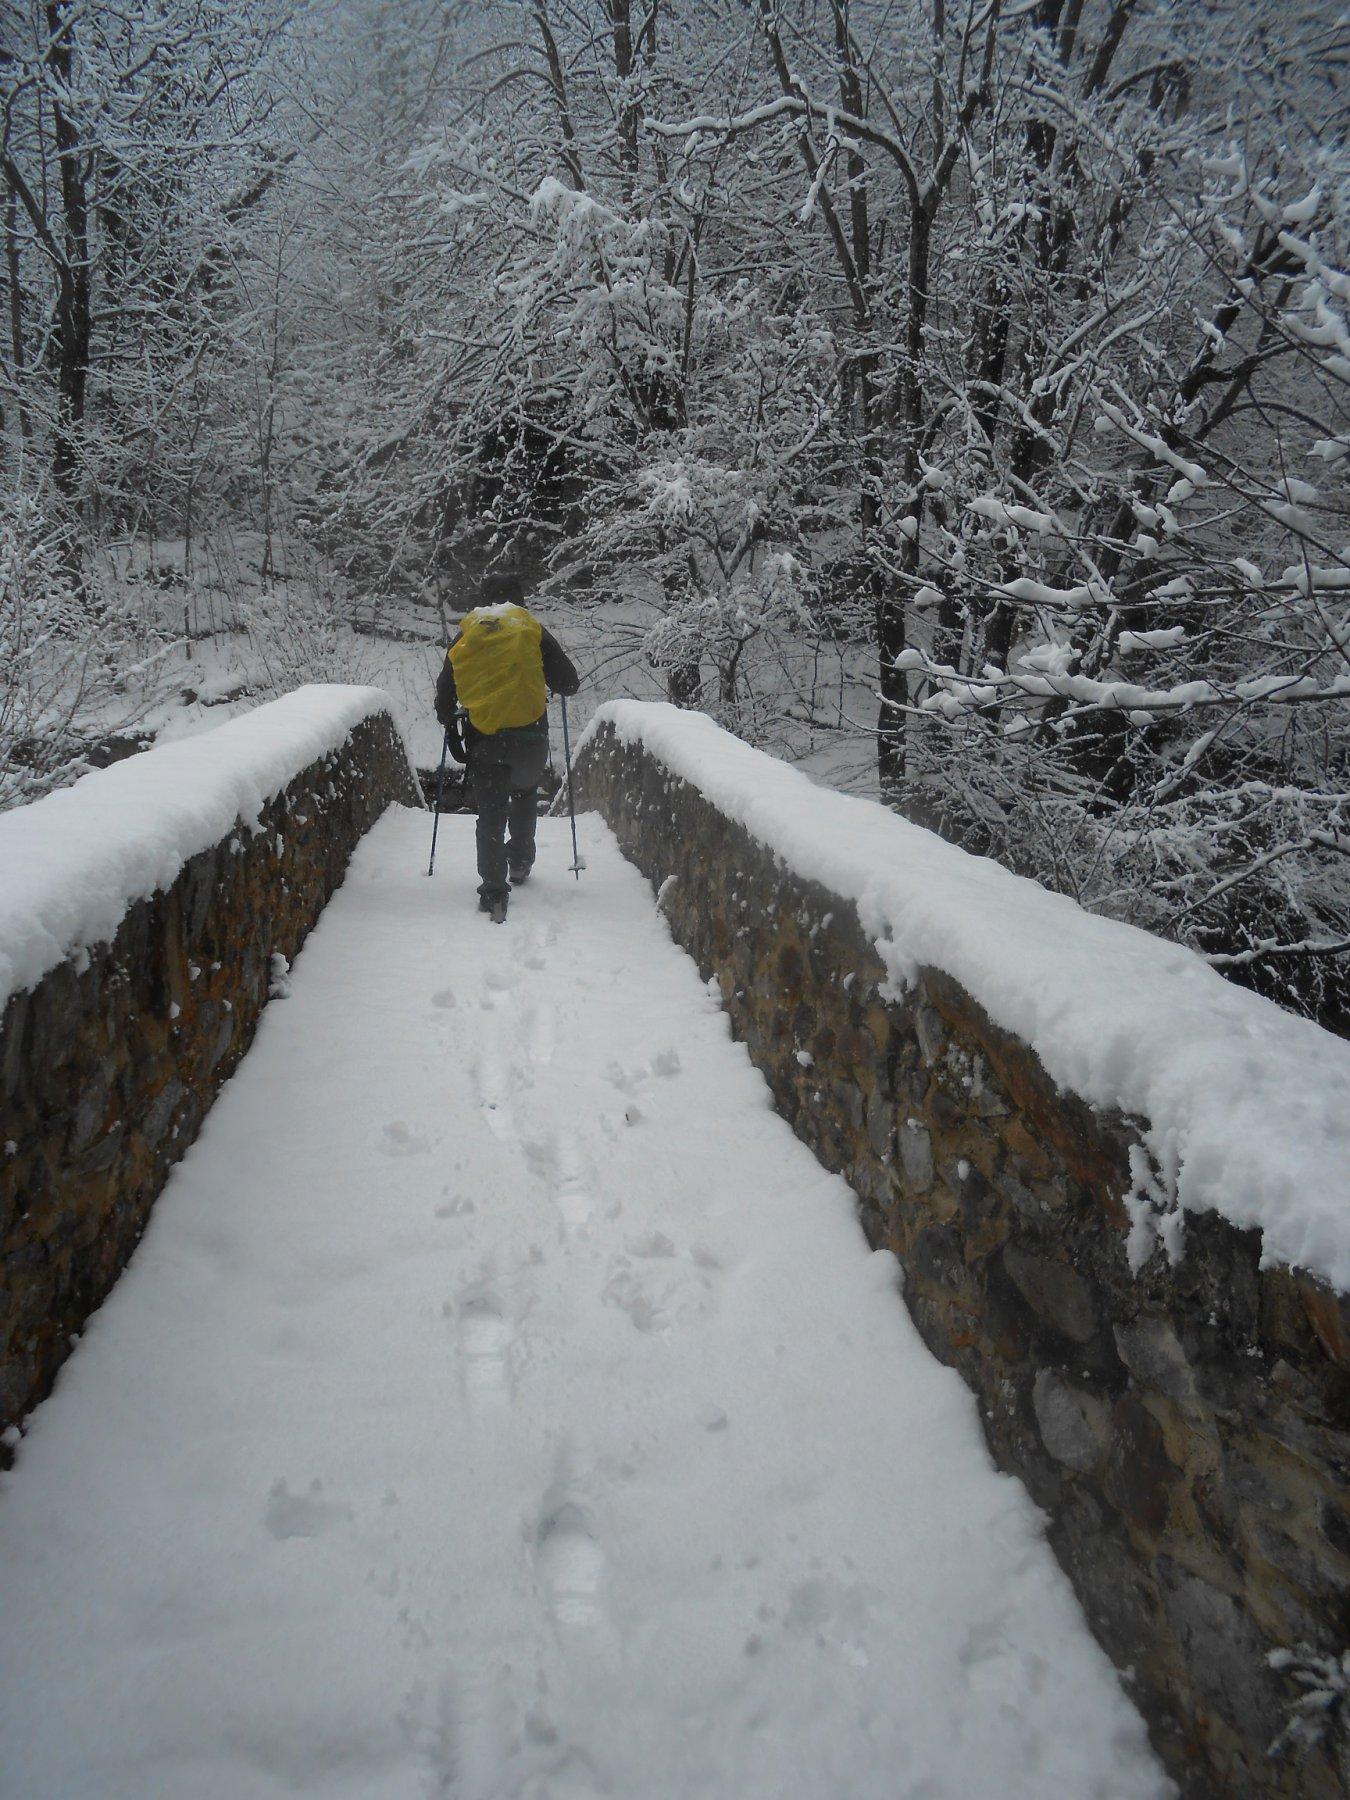 Ponte del Linguissot